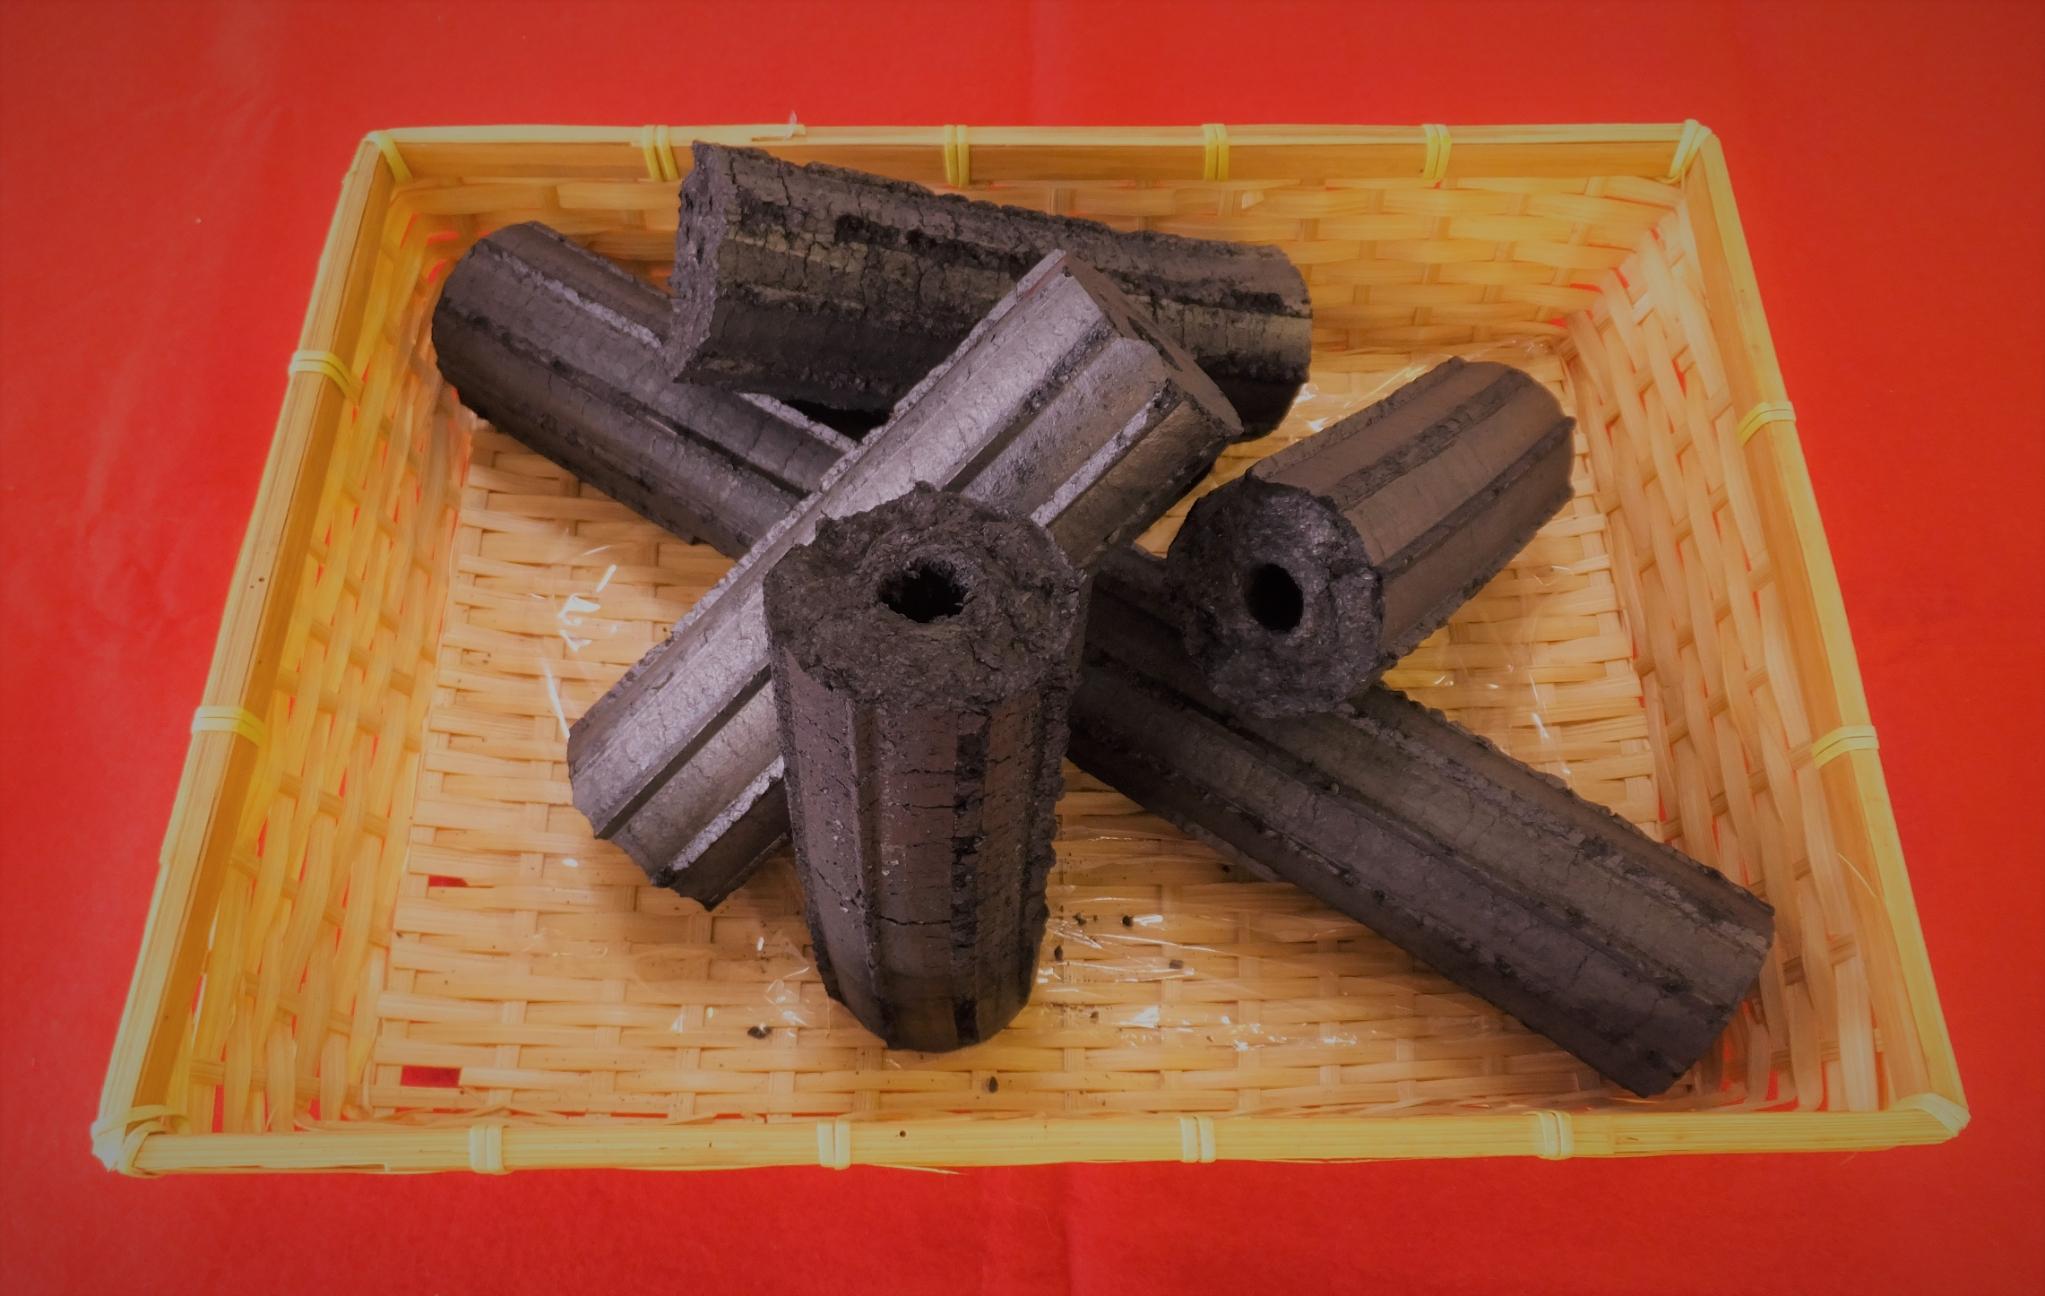 H29逸品 モミ炭